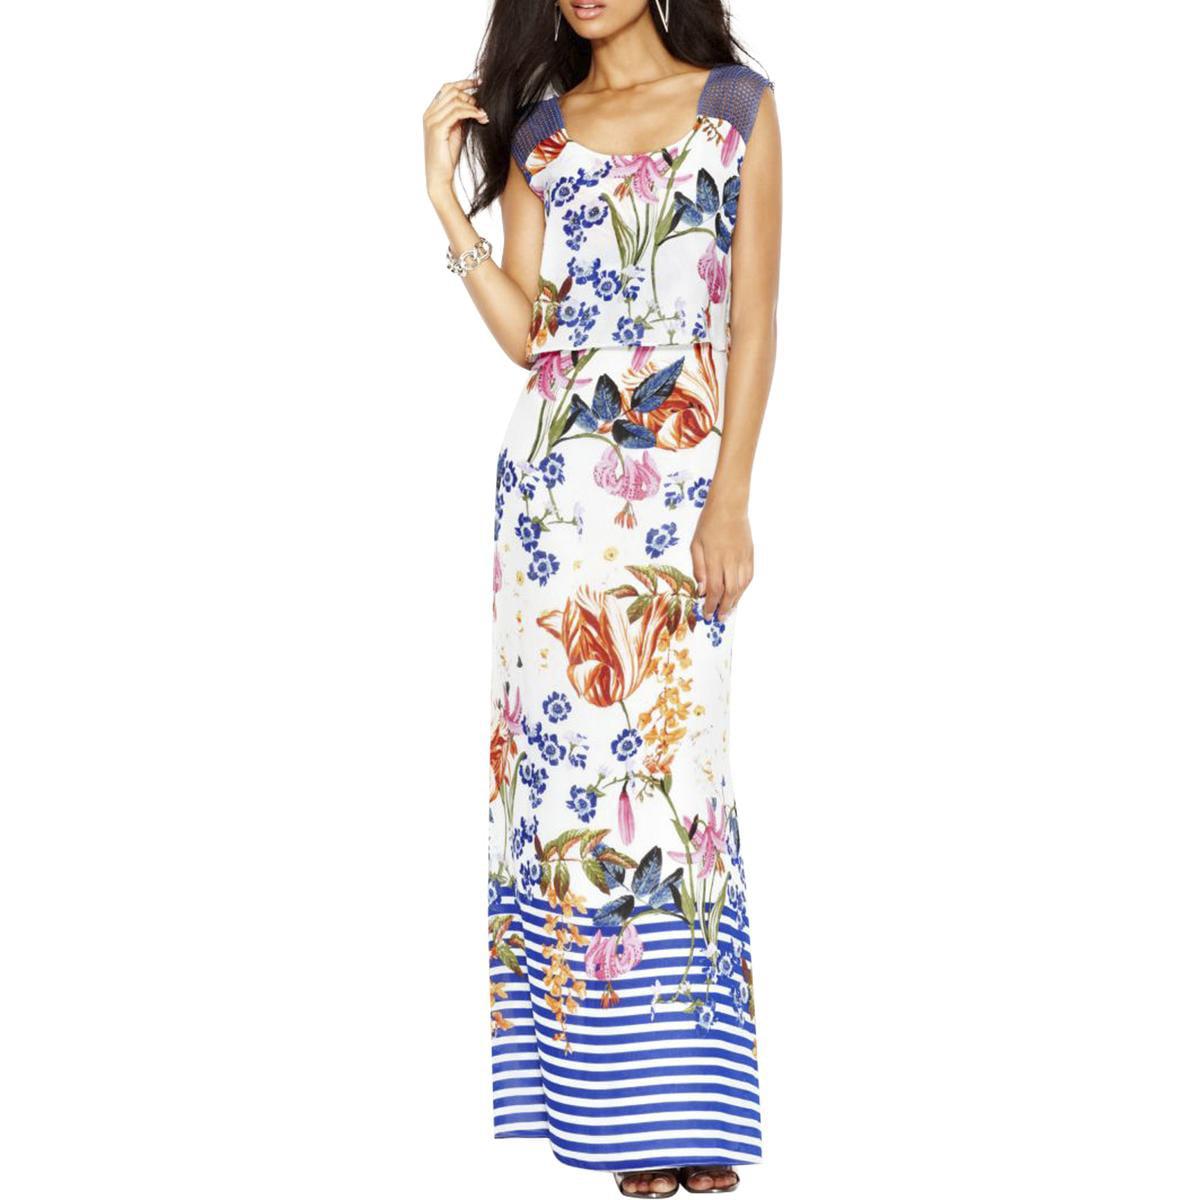 Jessica Simpson Womens Chiffon Sleeveless Maxi Dress